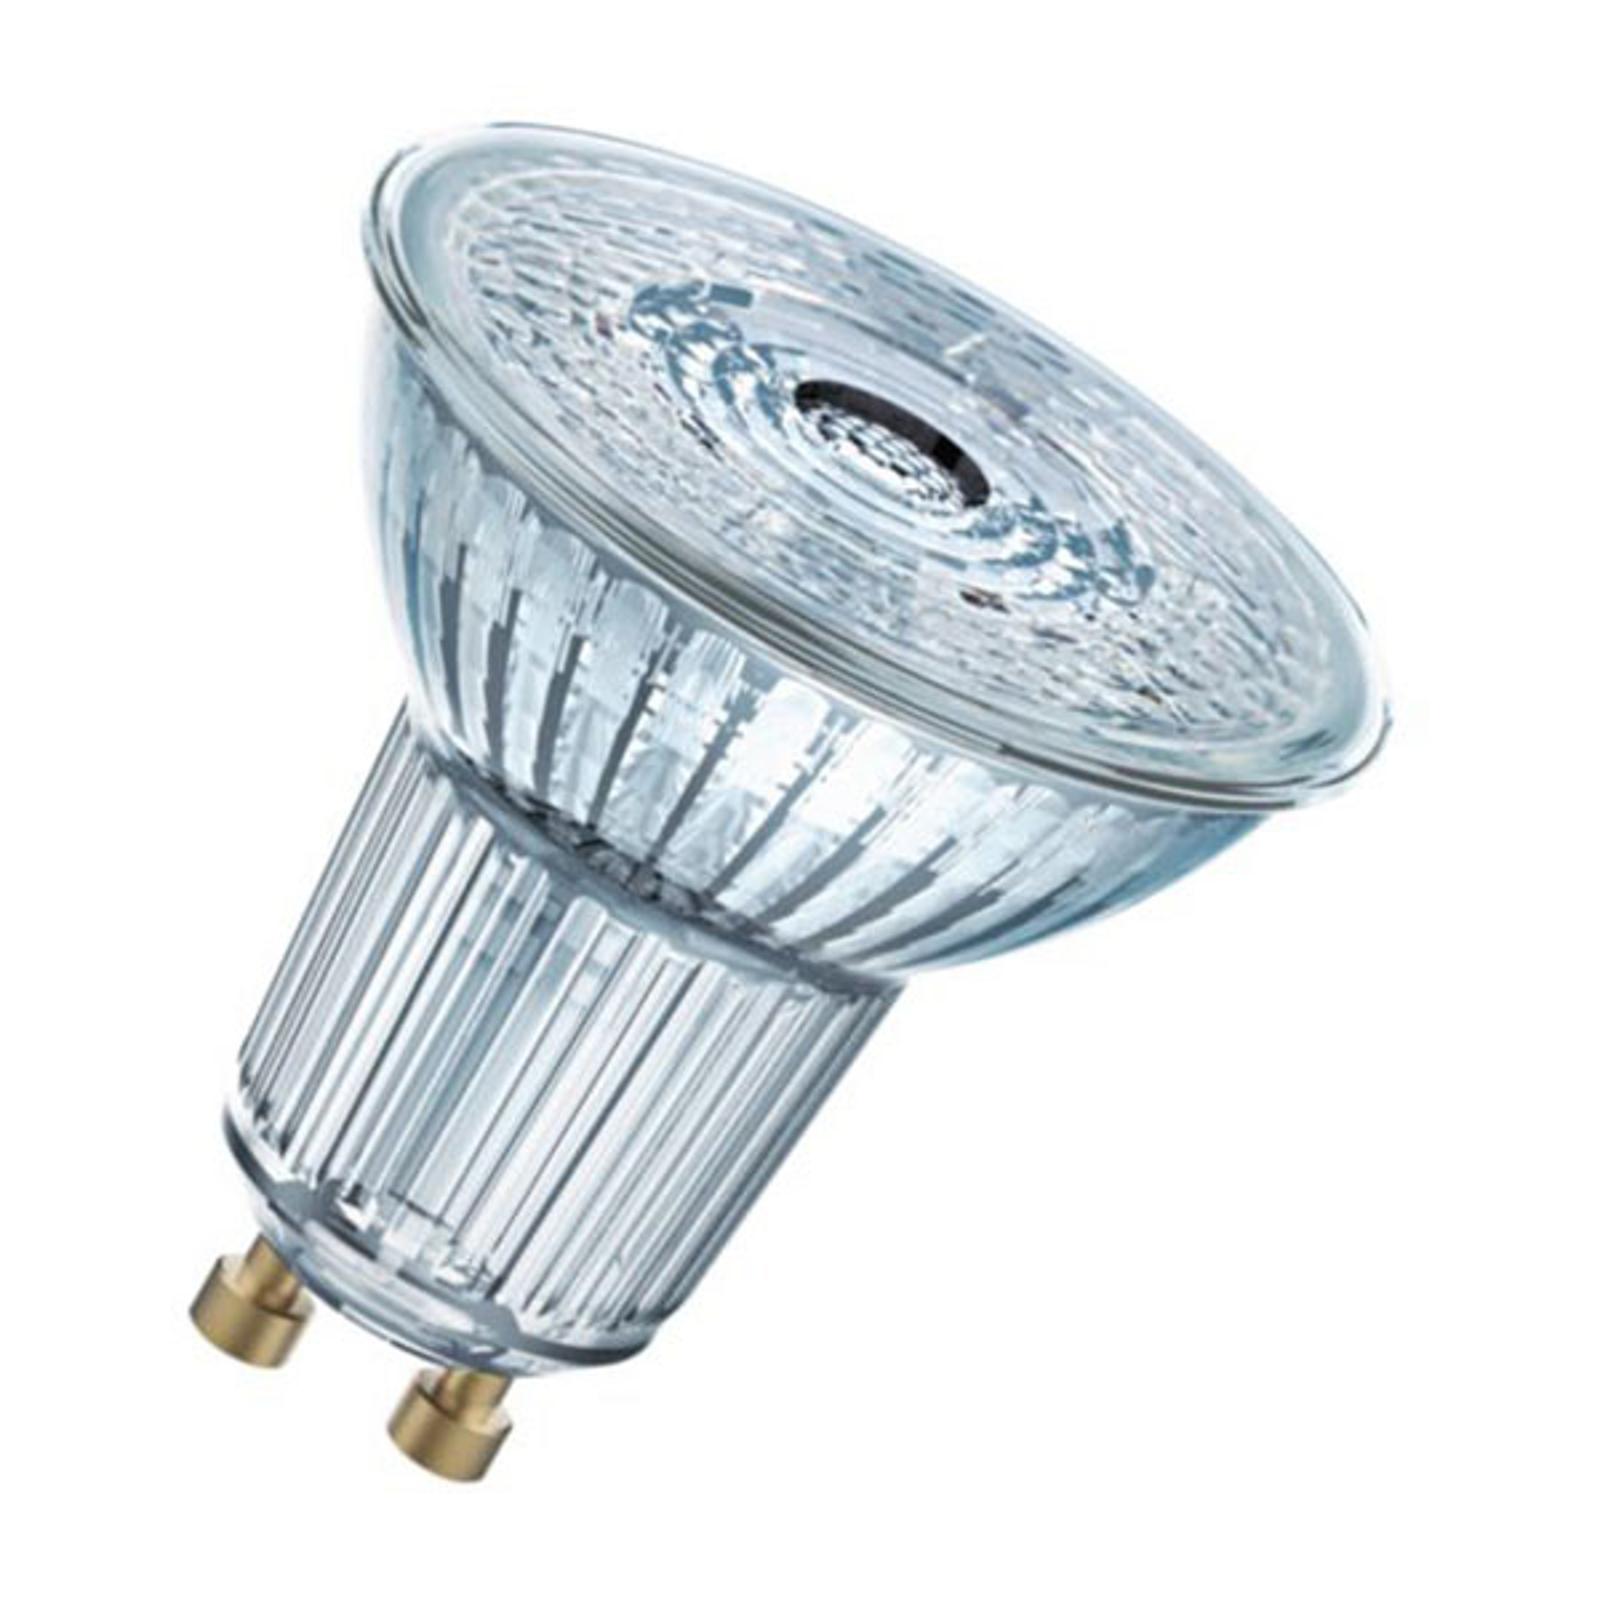 OSRAM LED-Reflektor GU10 4,3W PAR16 827 36° 3er